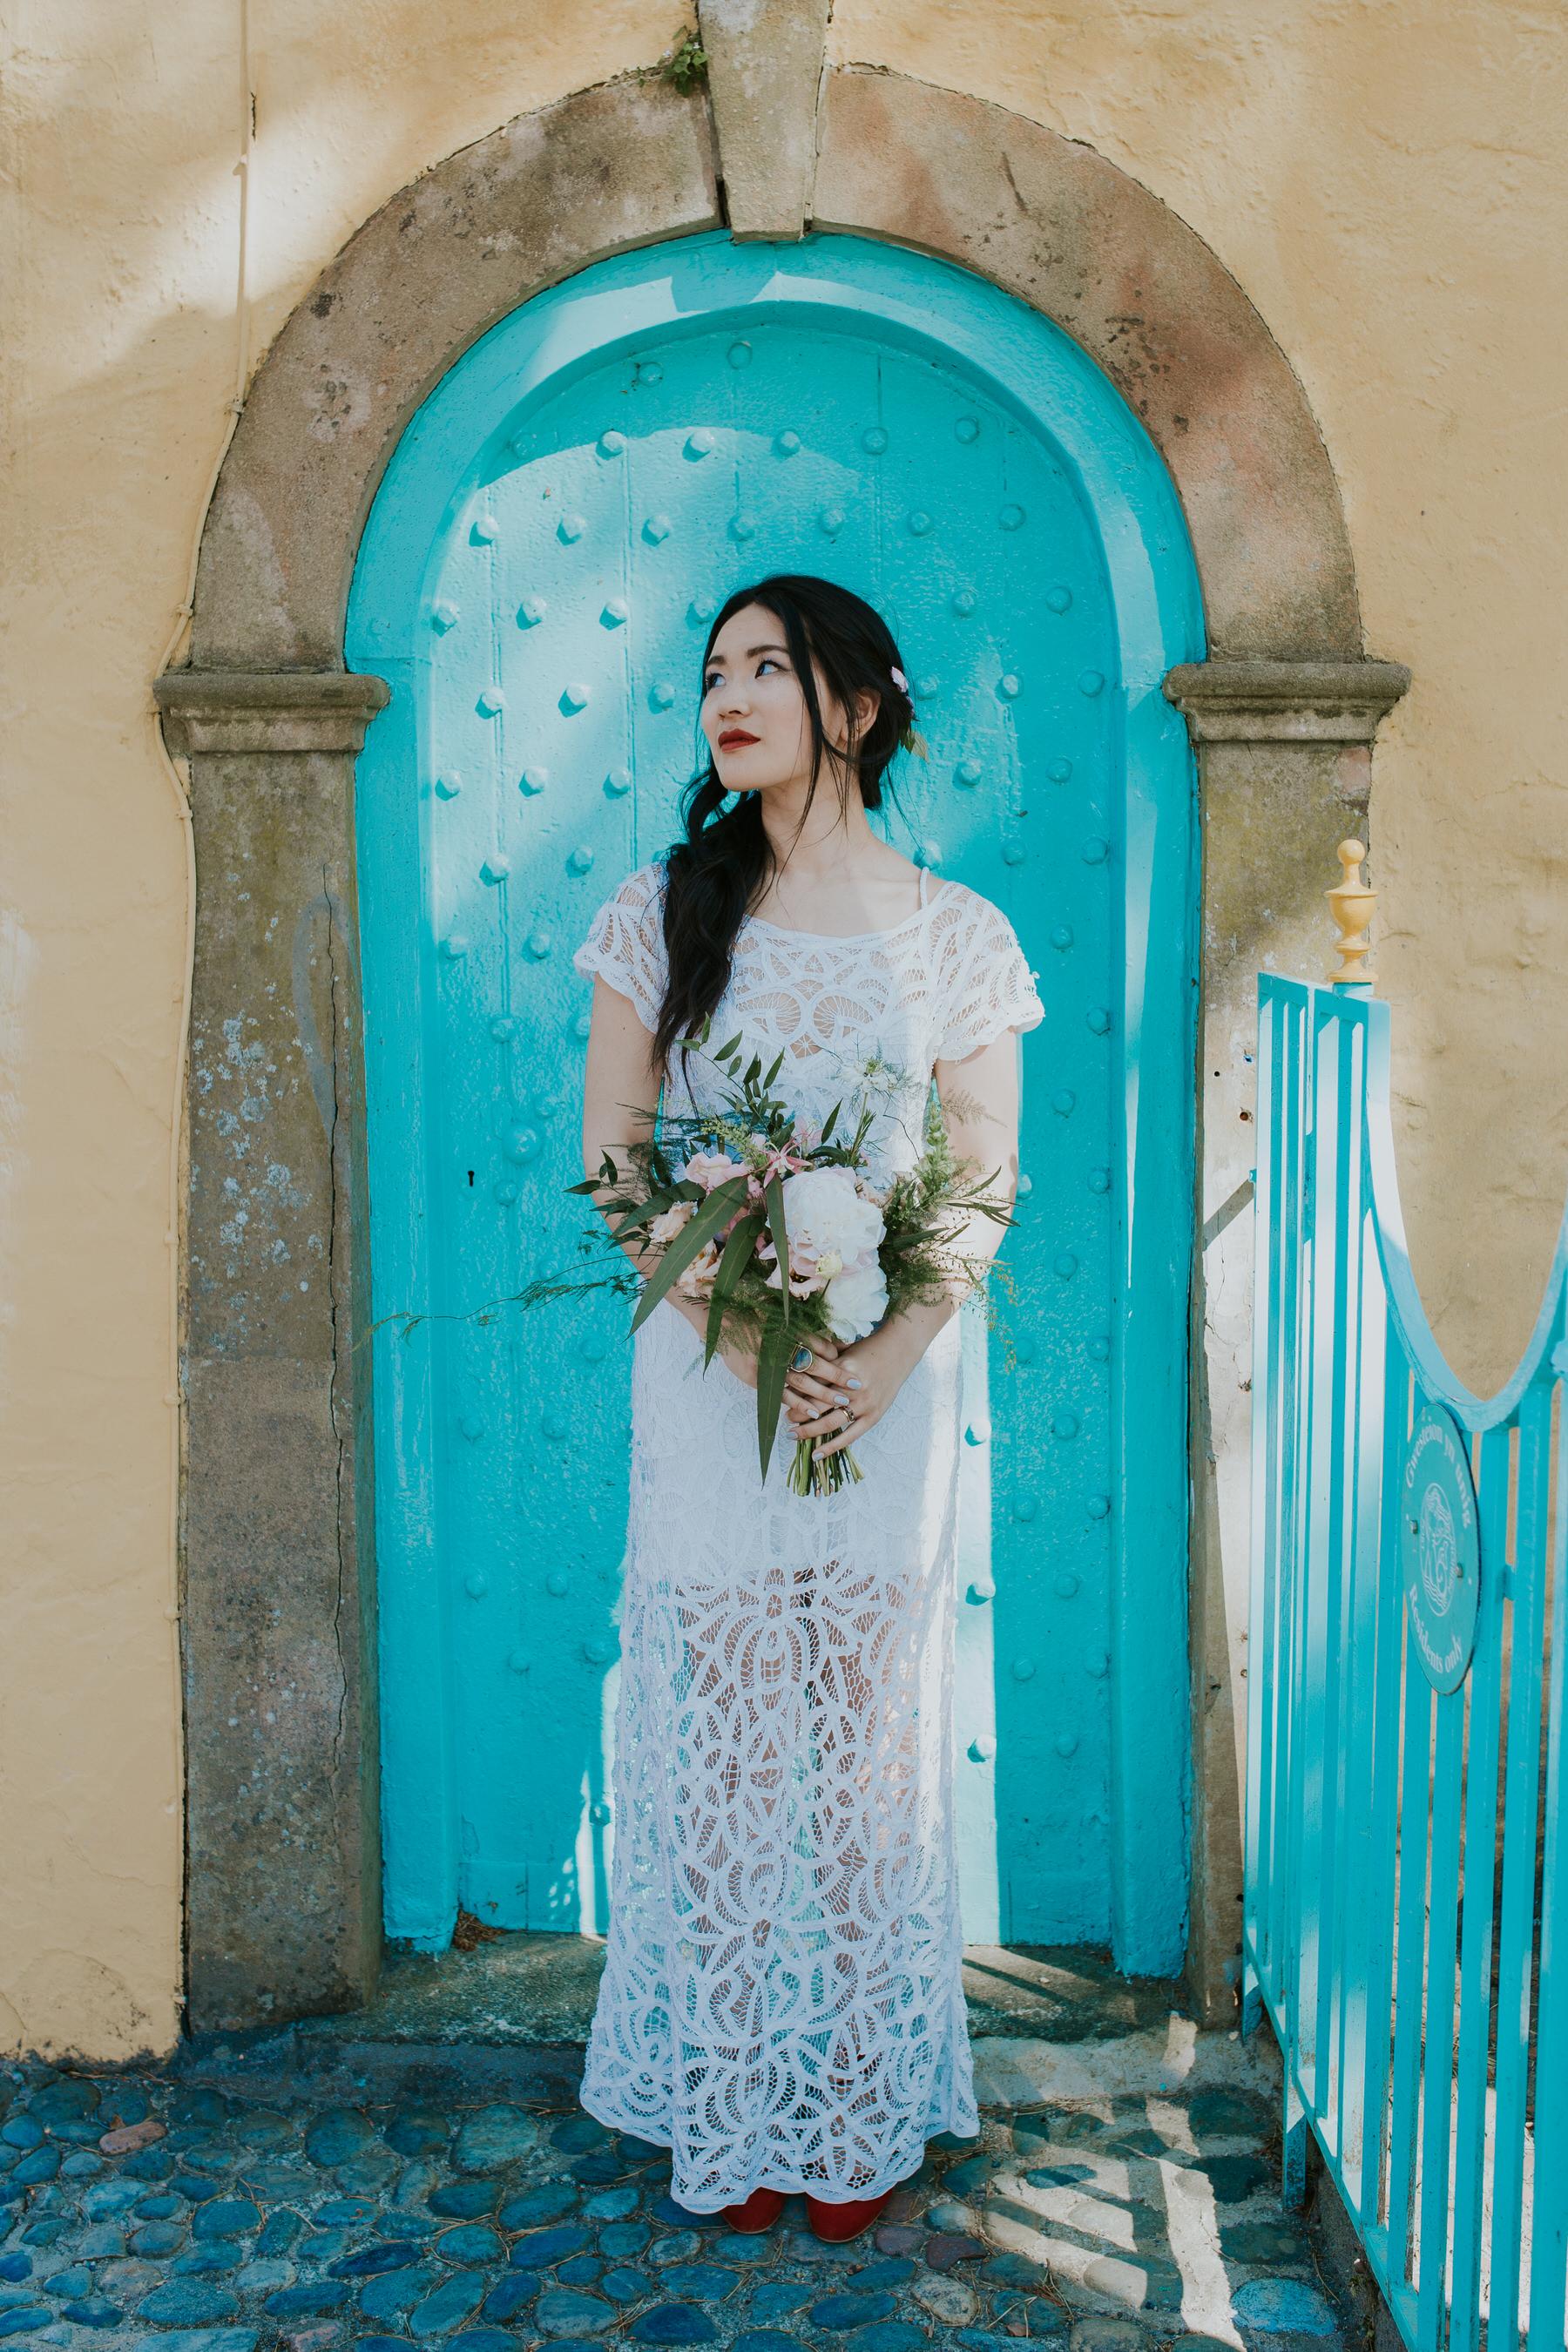 813 elegant Shaina bridal portrait turquoise door Portmeirion.jpg